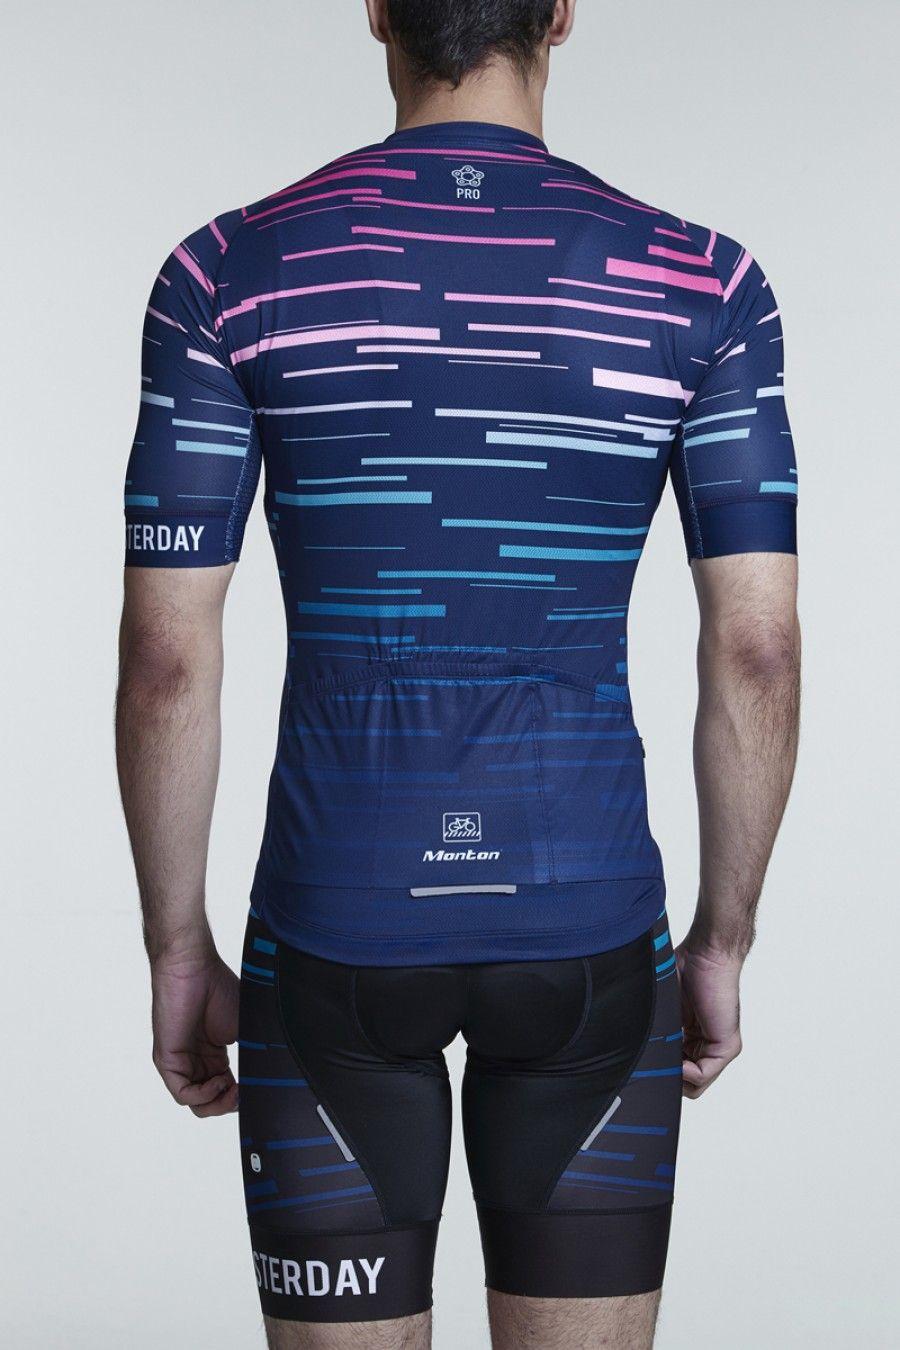 cool cycling jersey  0dc4d5fb1